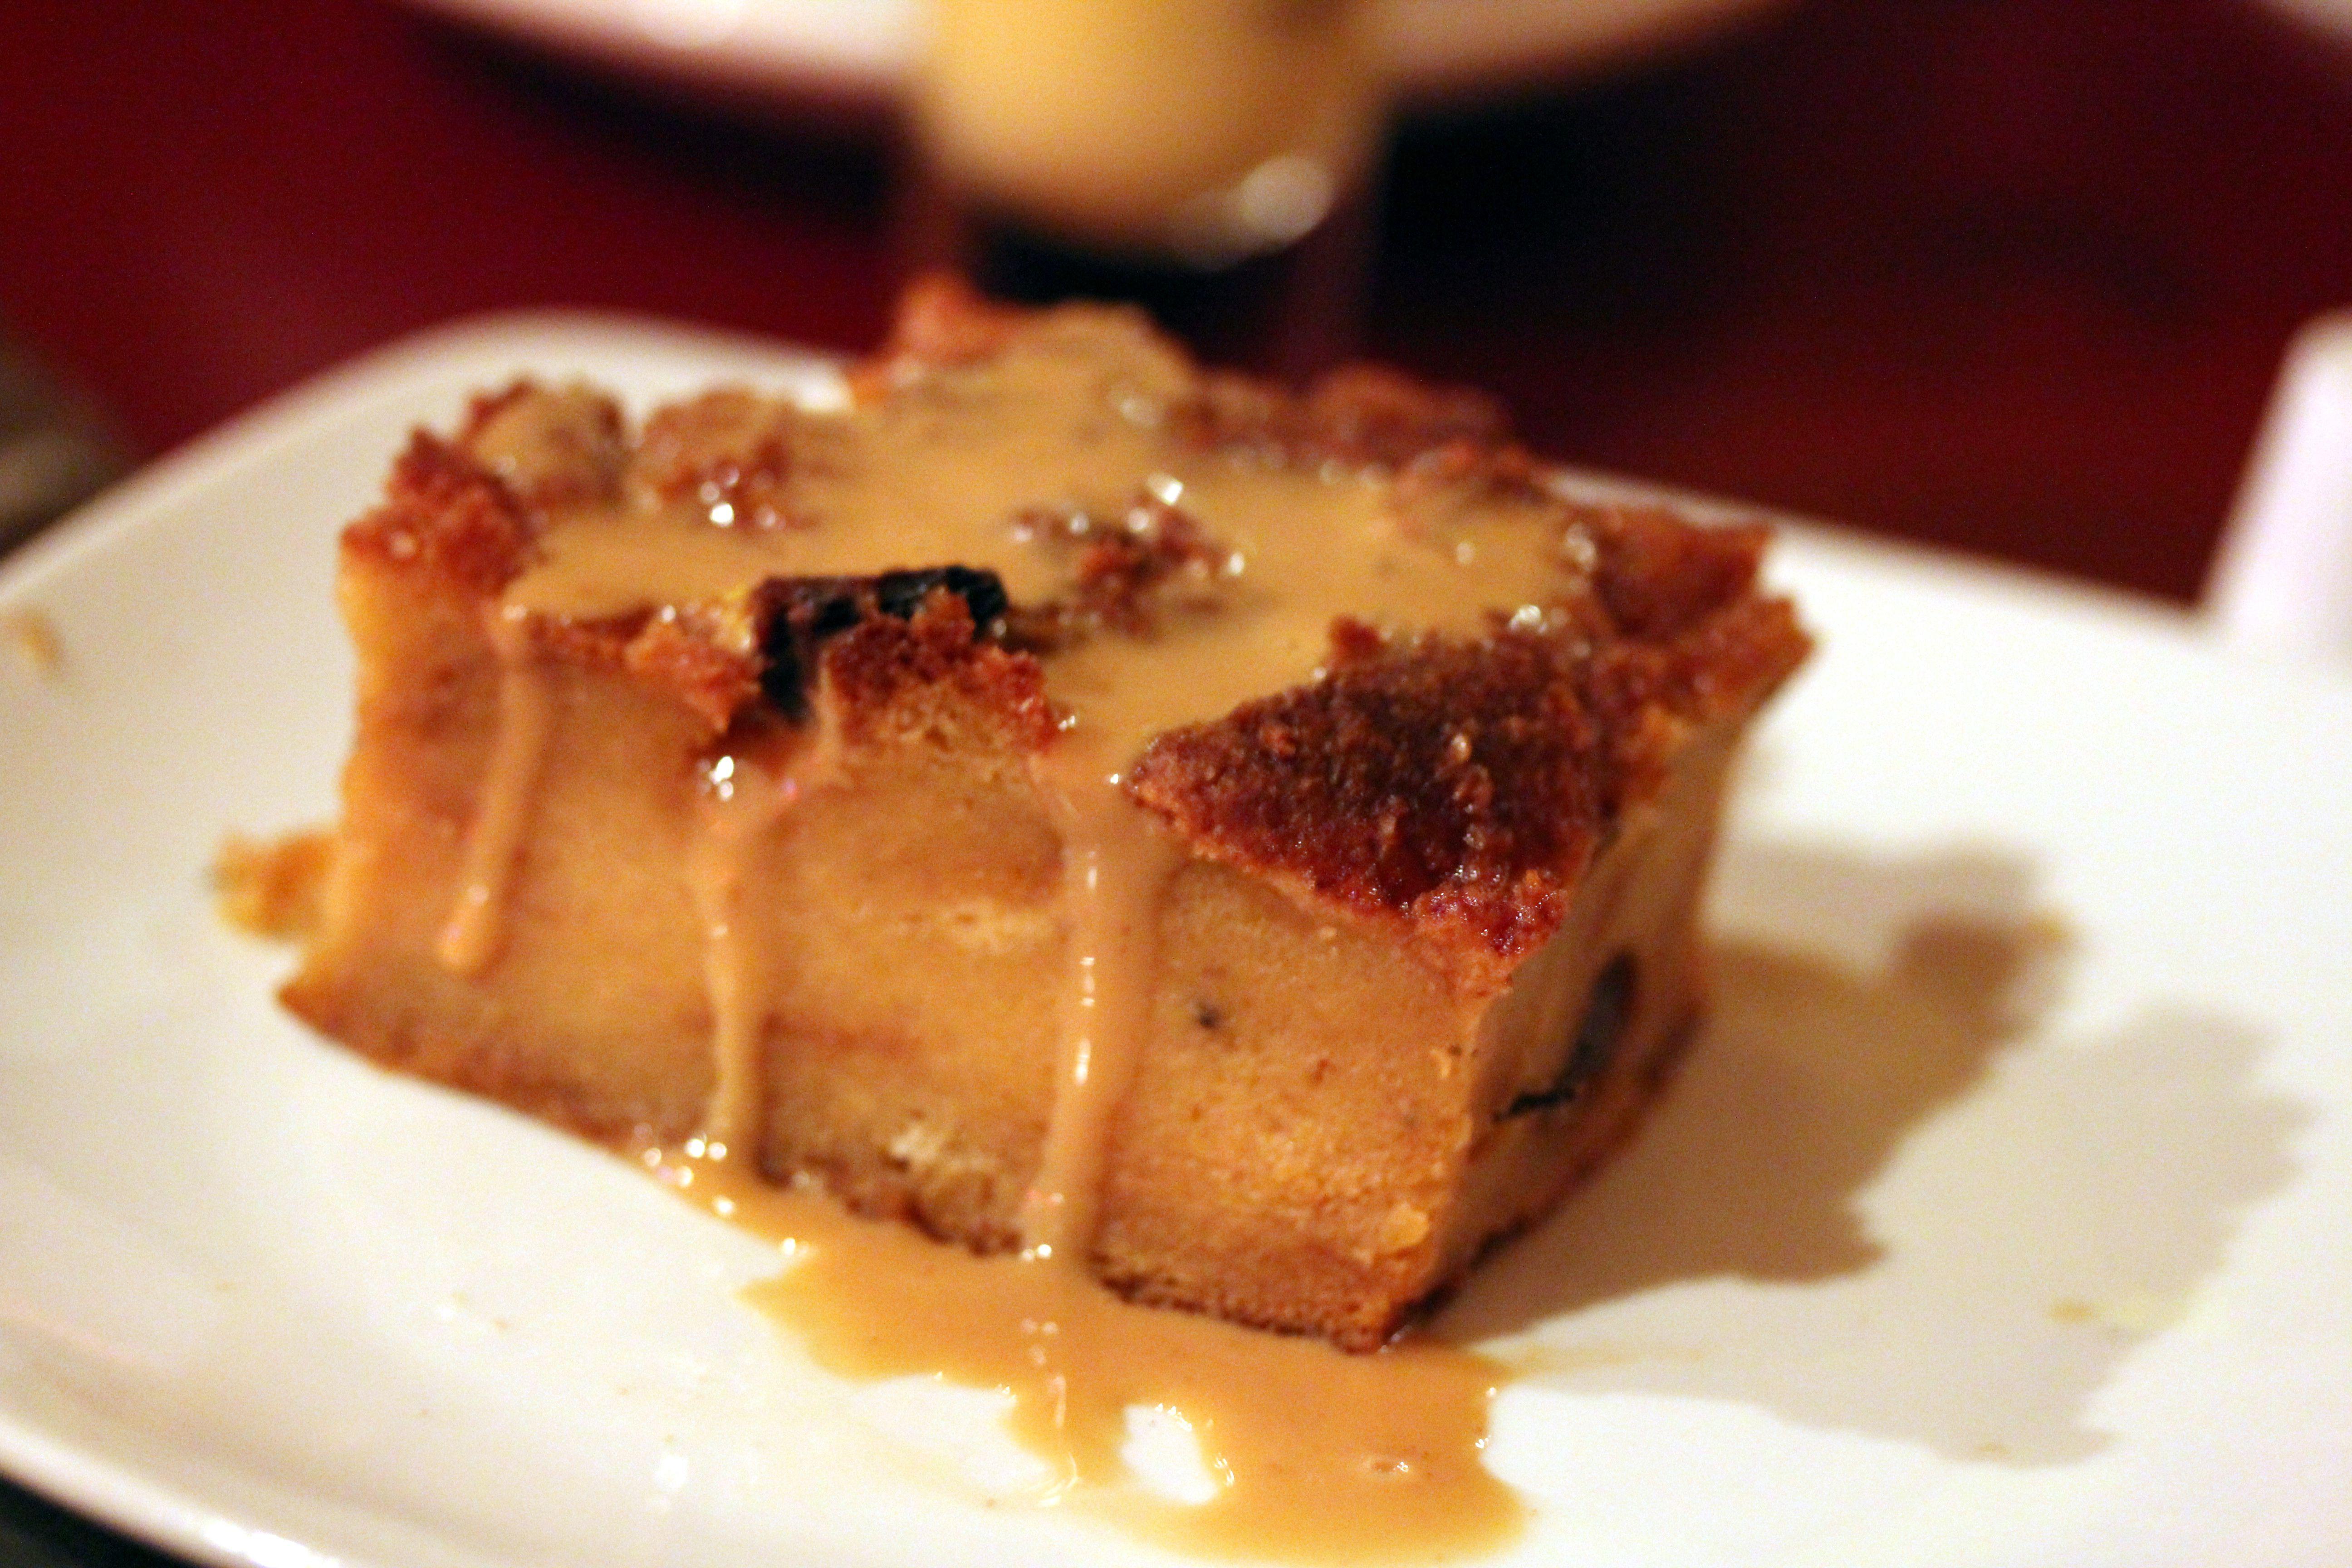 Creamy Brown Sugar Sauce With Vanilla Recipe